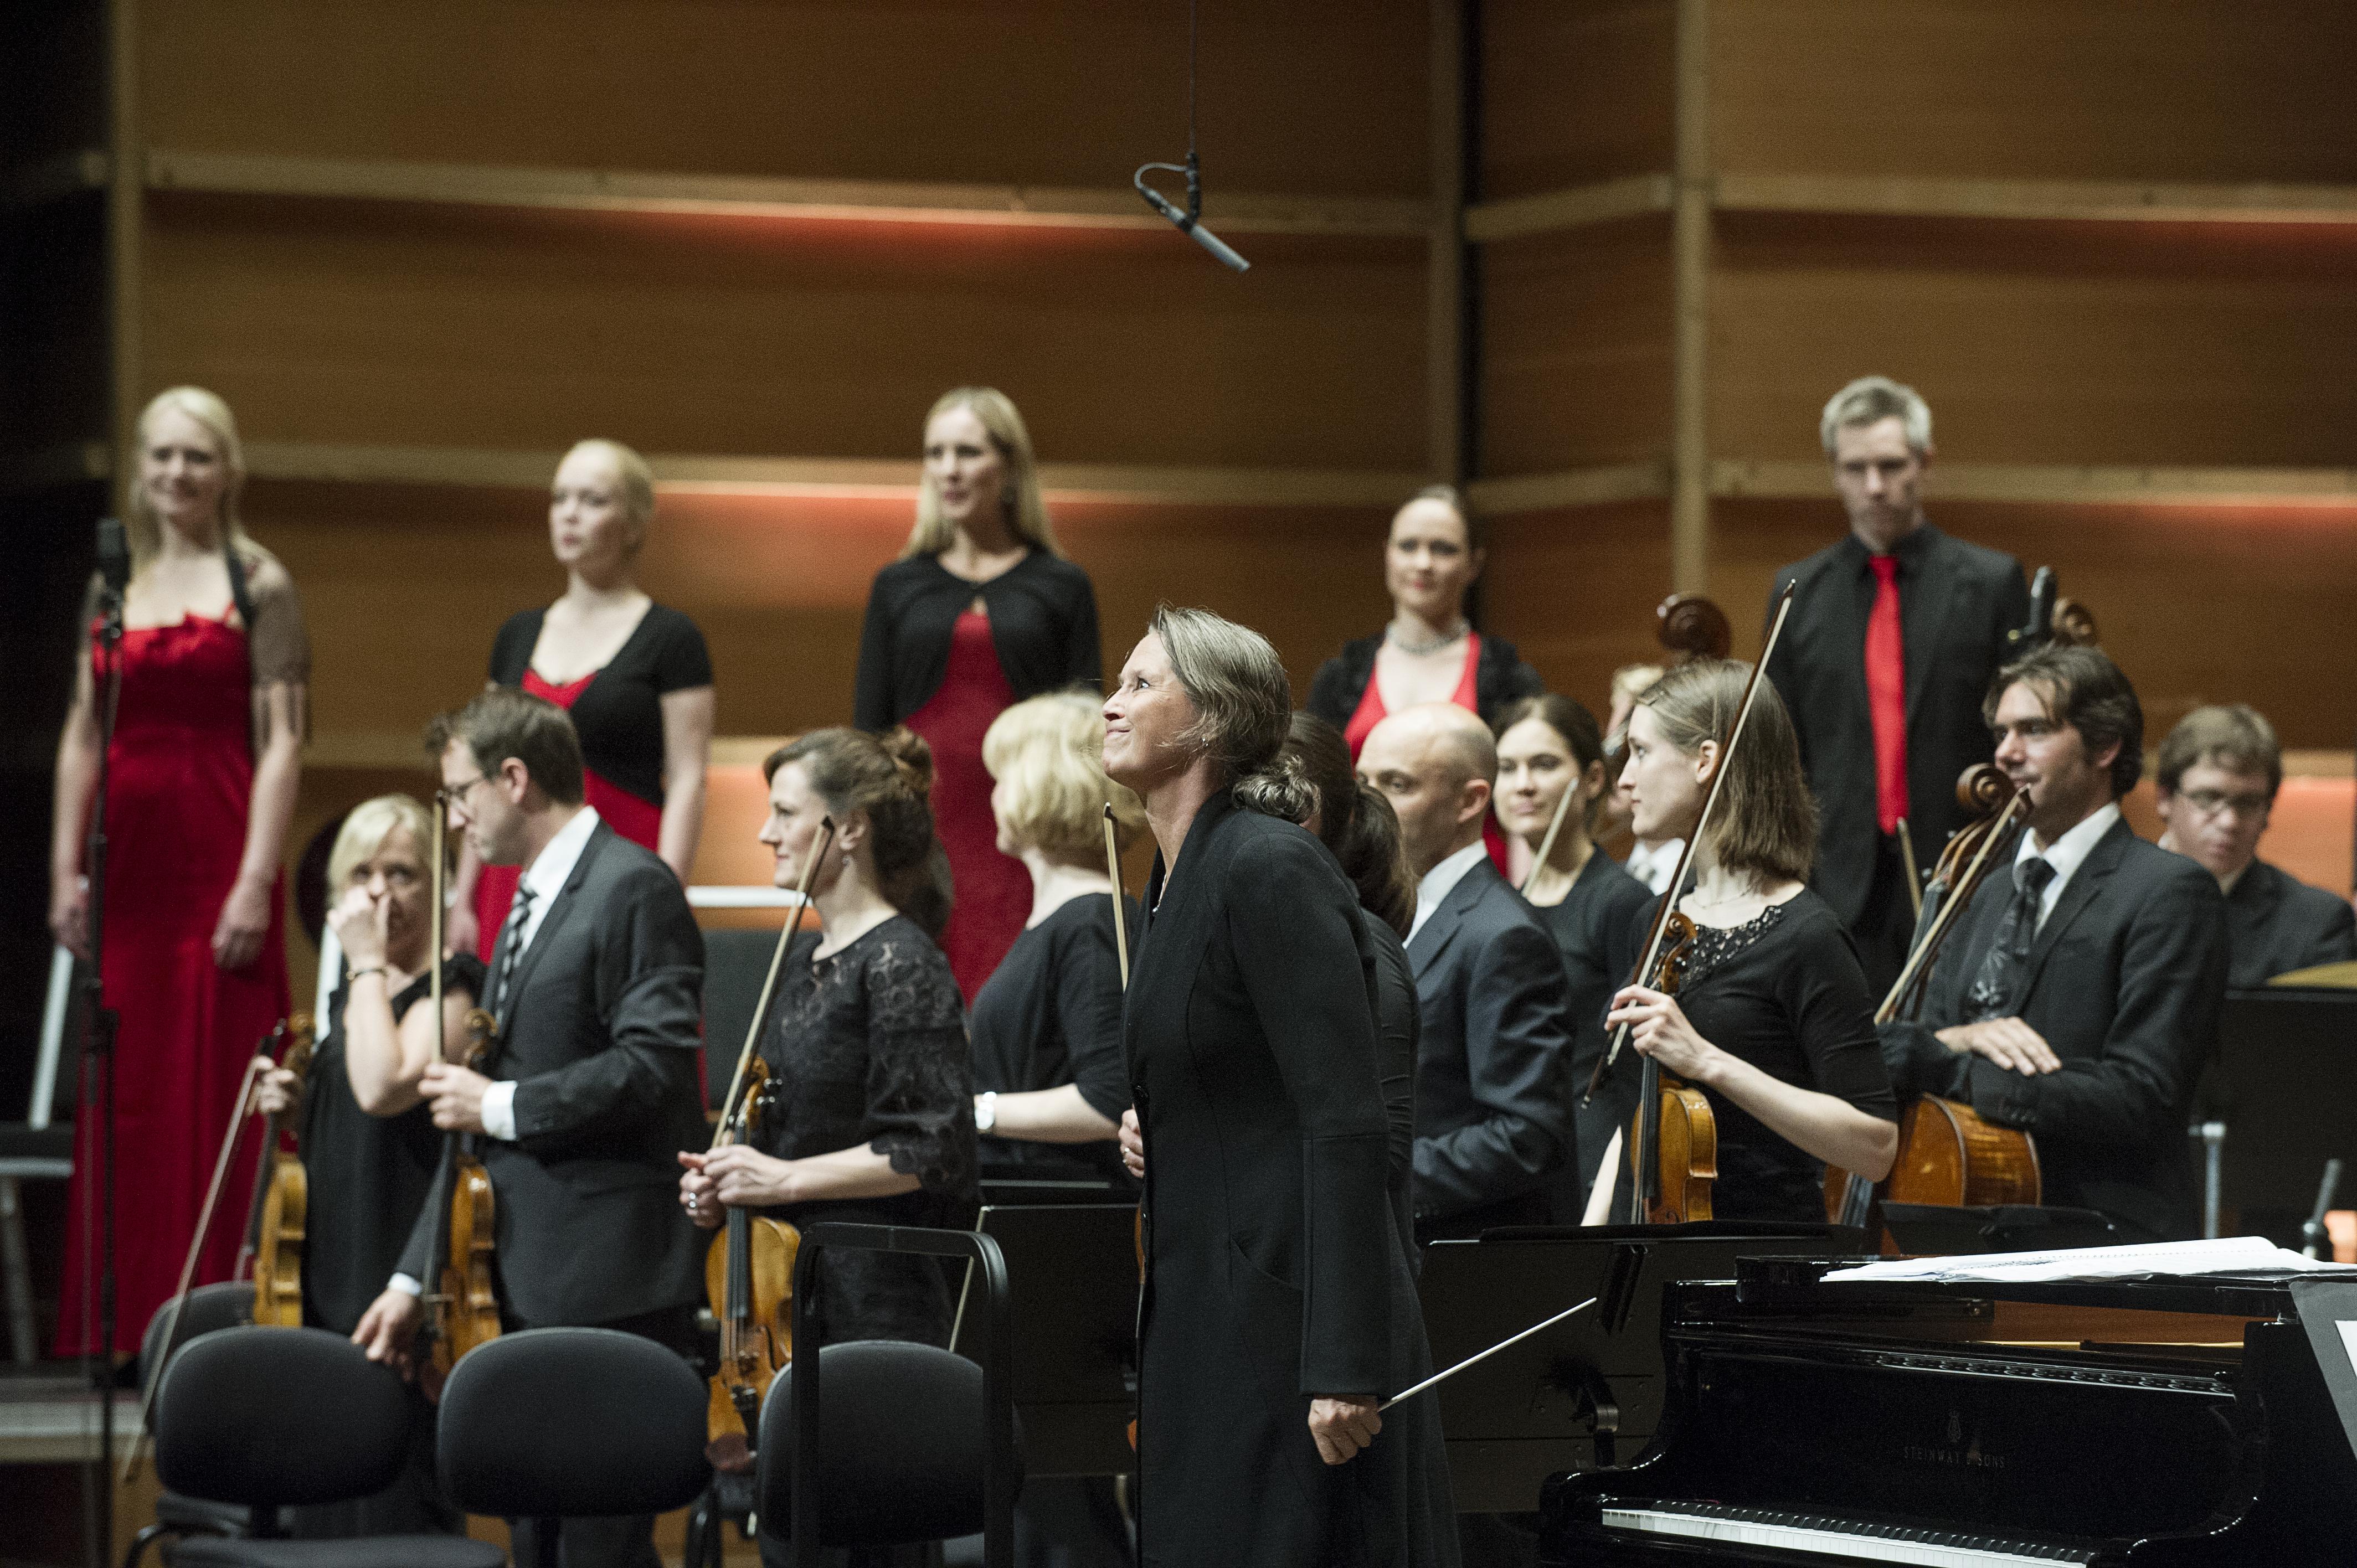 Det Norske Solistkor, Mahler Chamber Orchestra og Dirigent Grete Pedersen